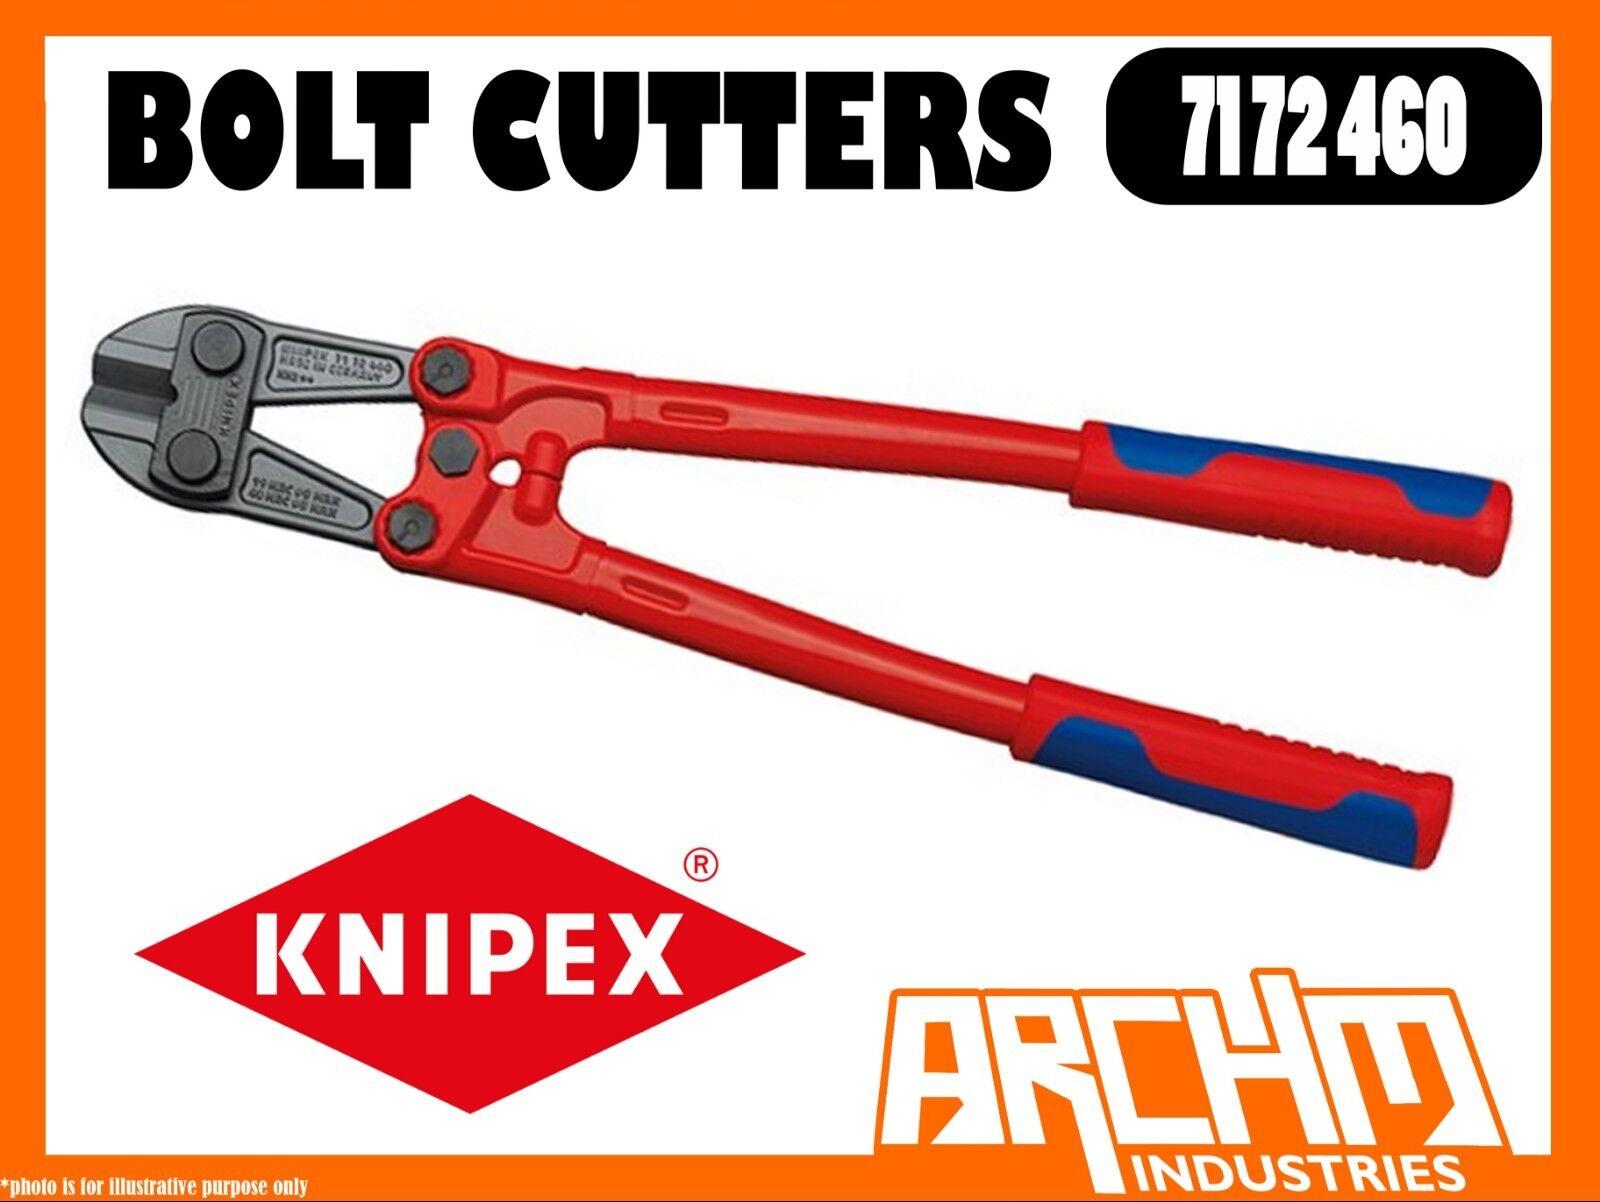 KNIPEX 7172460 - BOLT CUTTERS - 460MM - 48 HRC ROBUST CUTTING EDGES STEEL